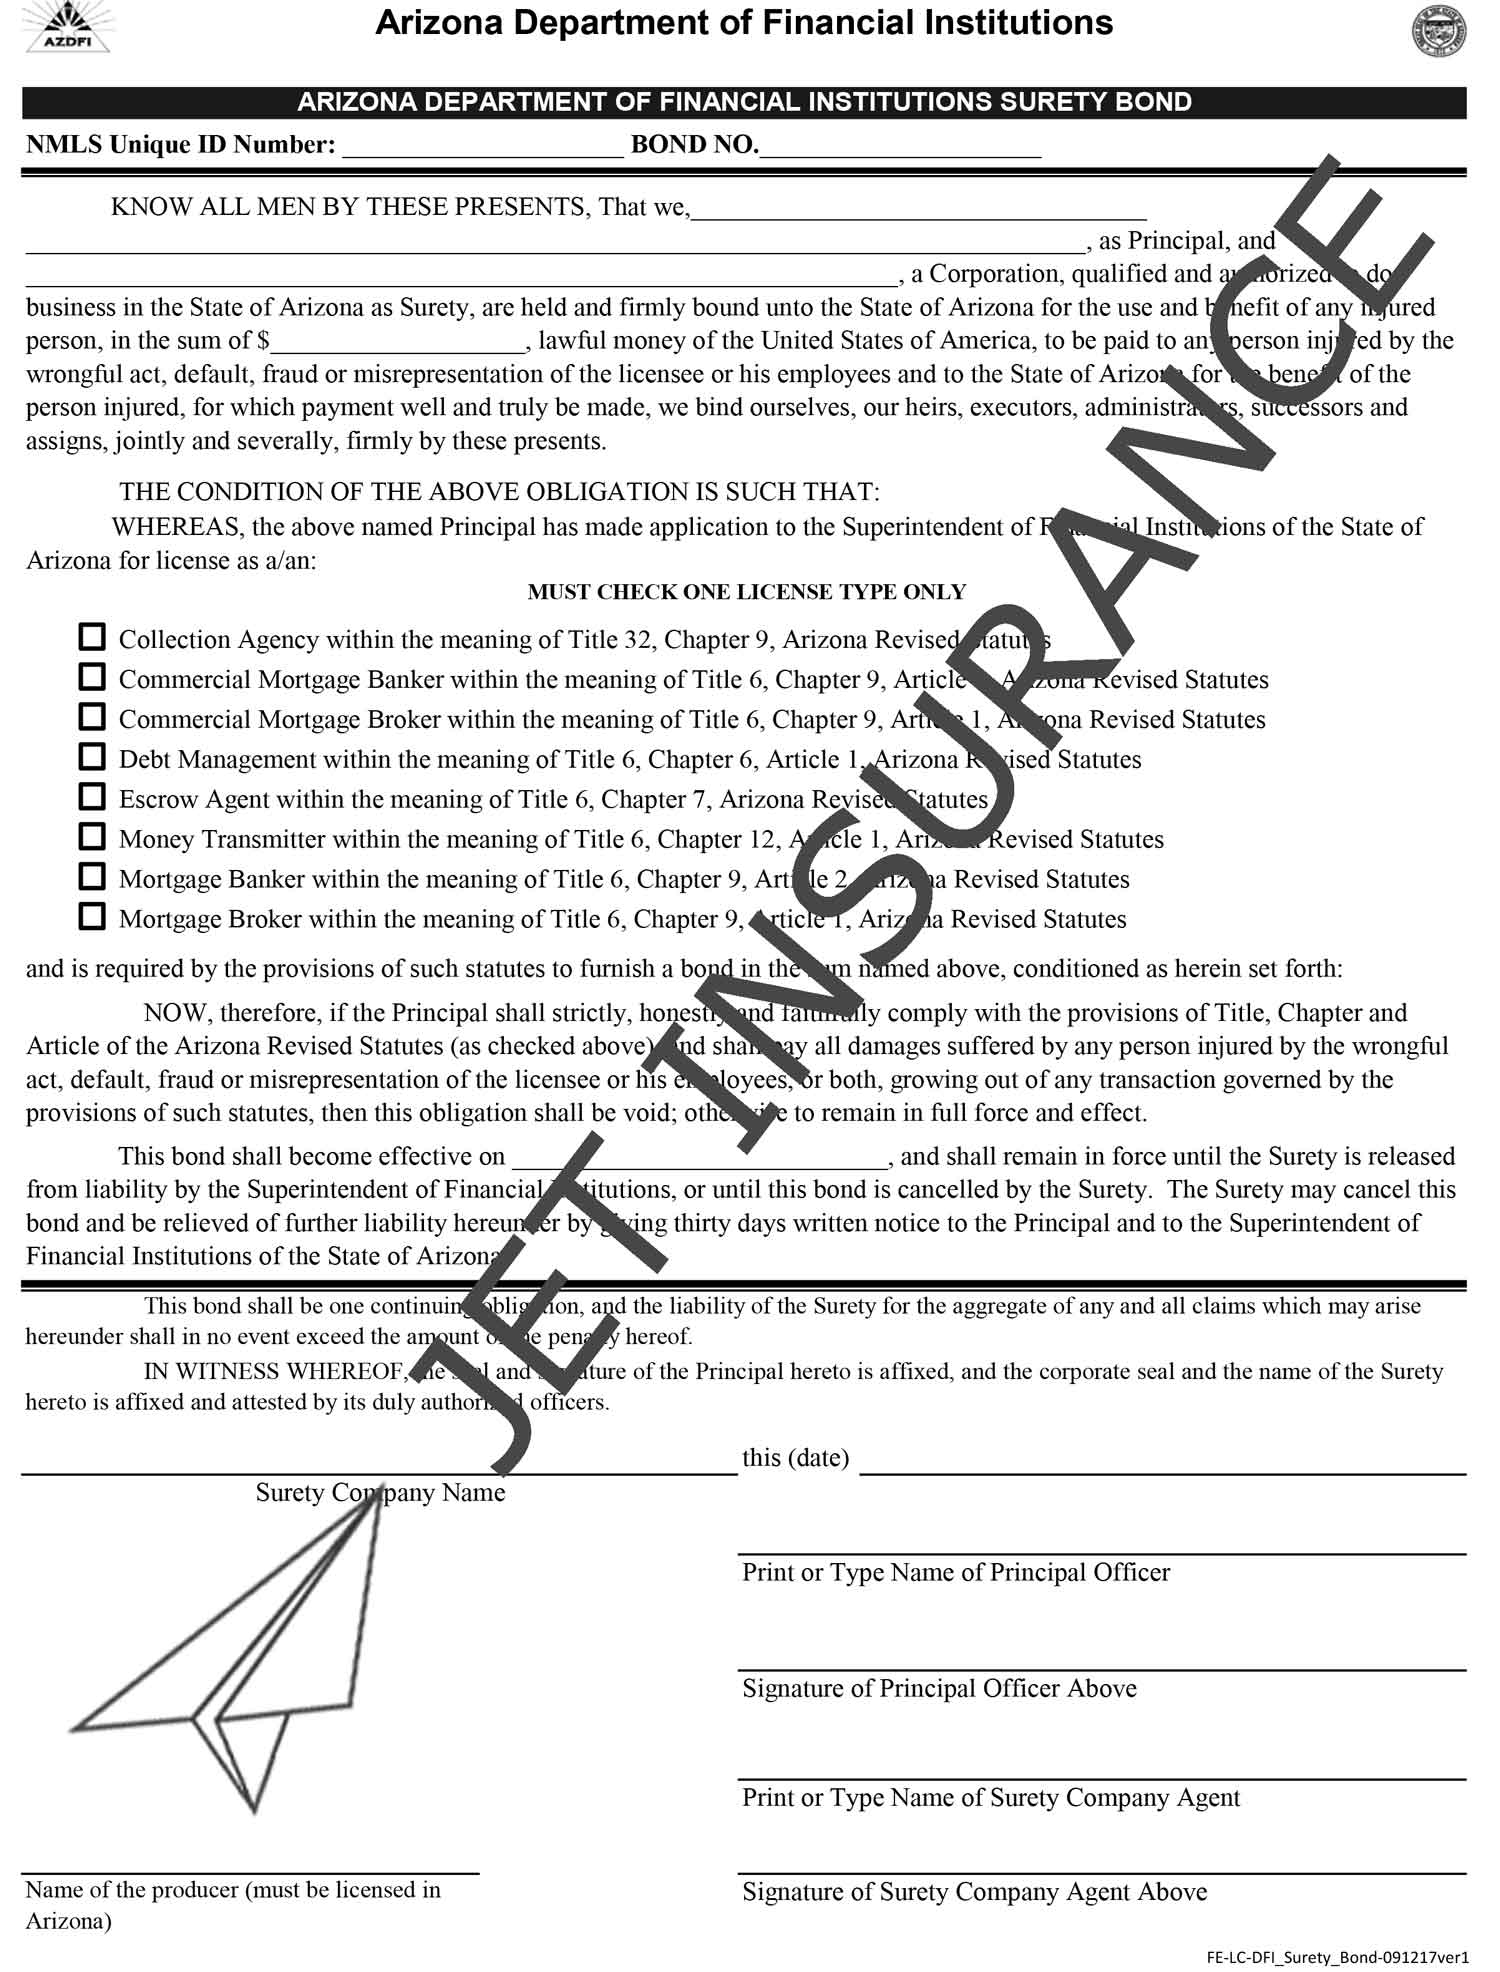 Arizona Debt Management Bond Form